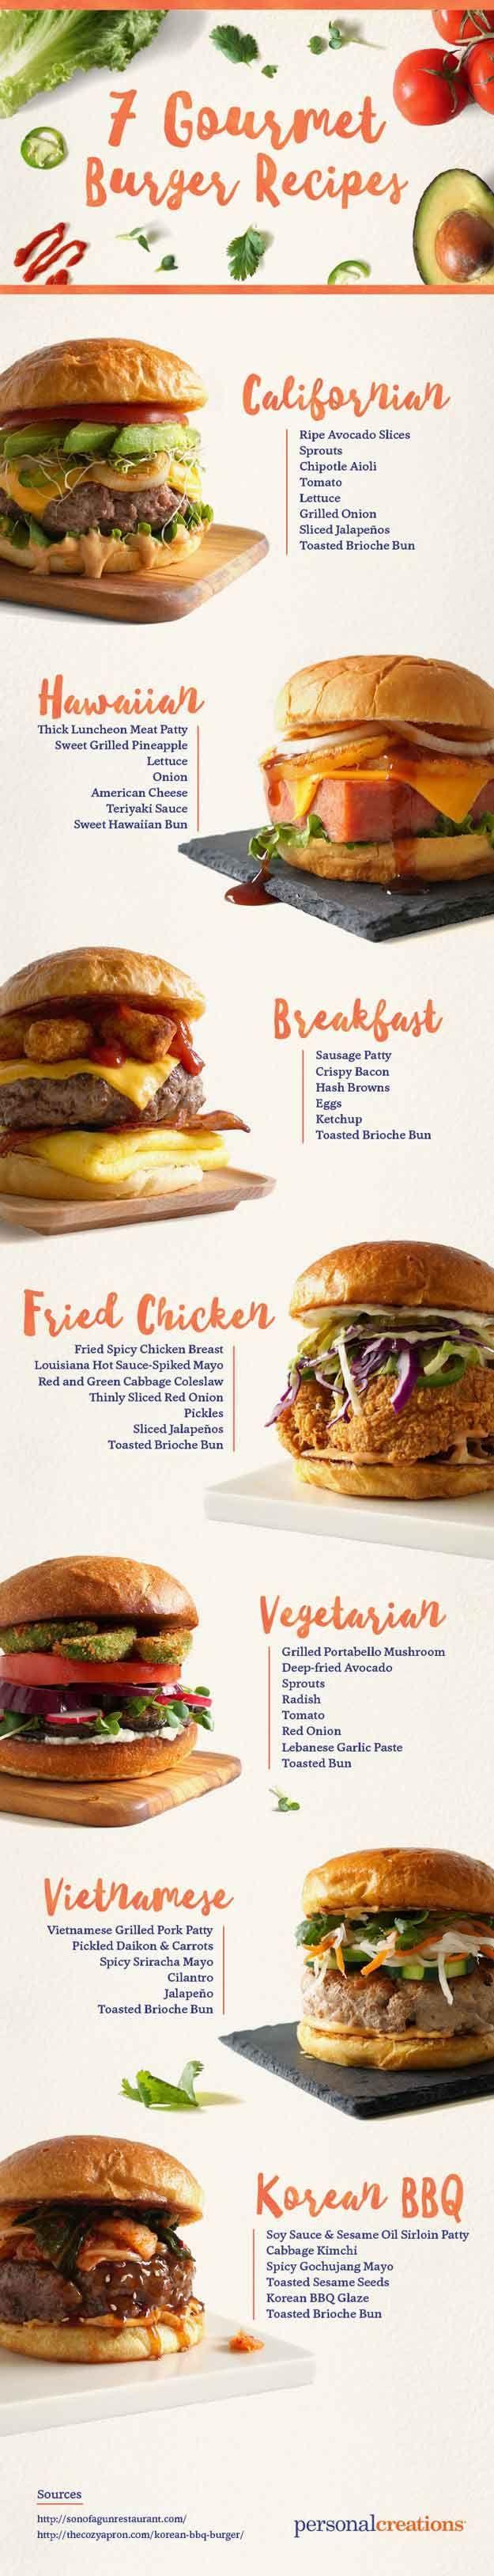 hamburger recipes to diy for dinner hamburgers